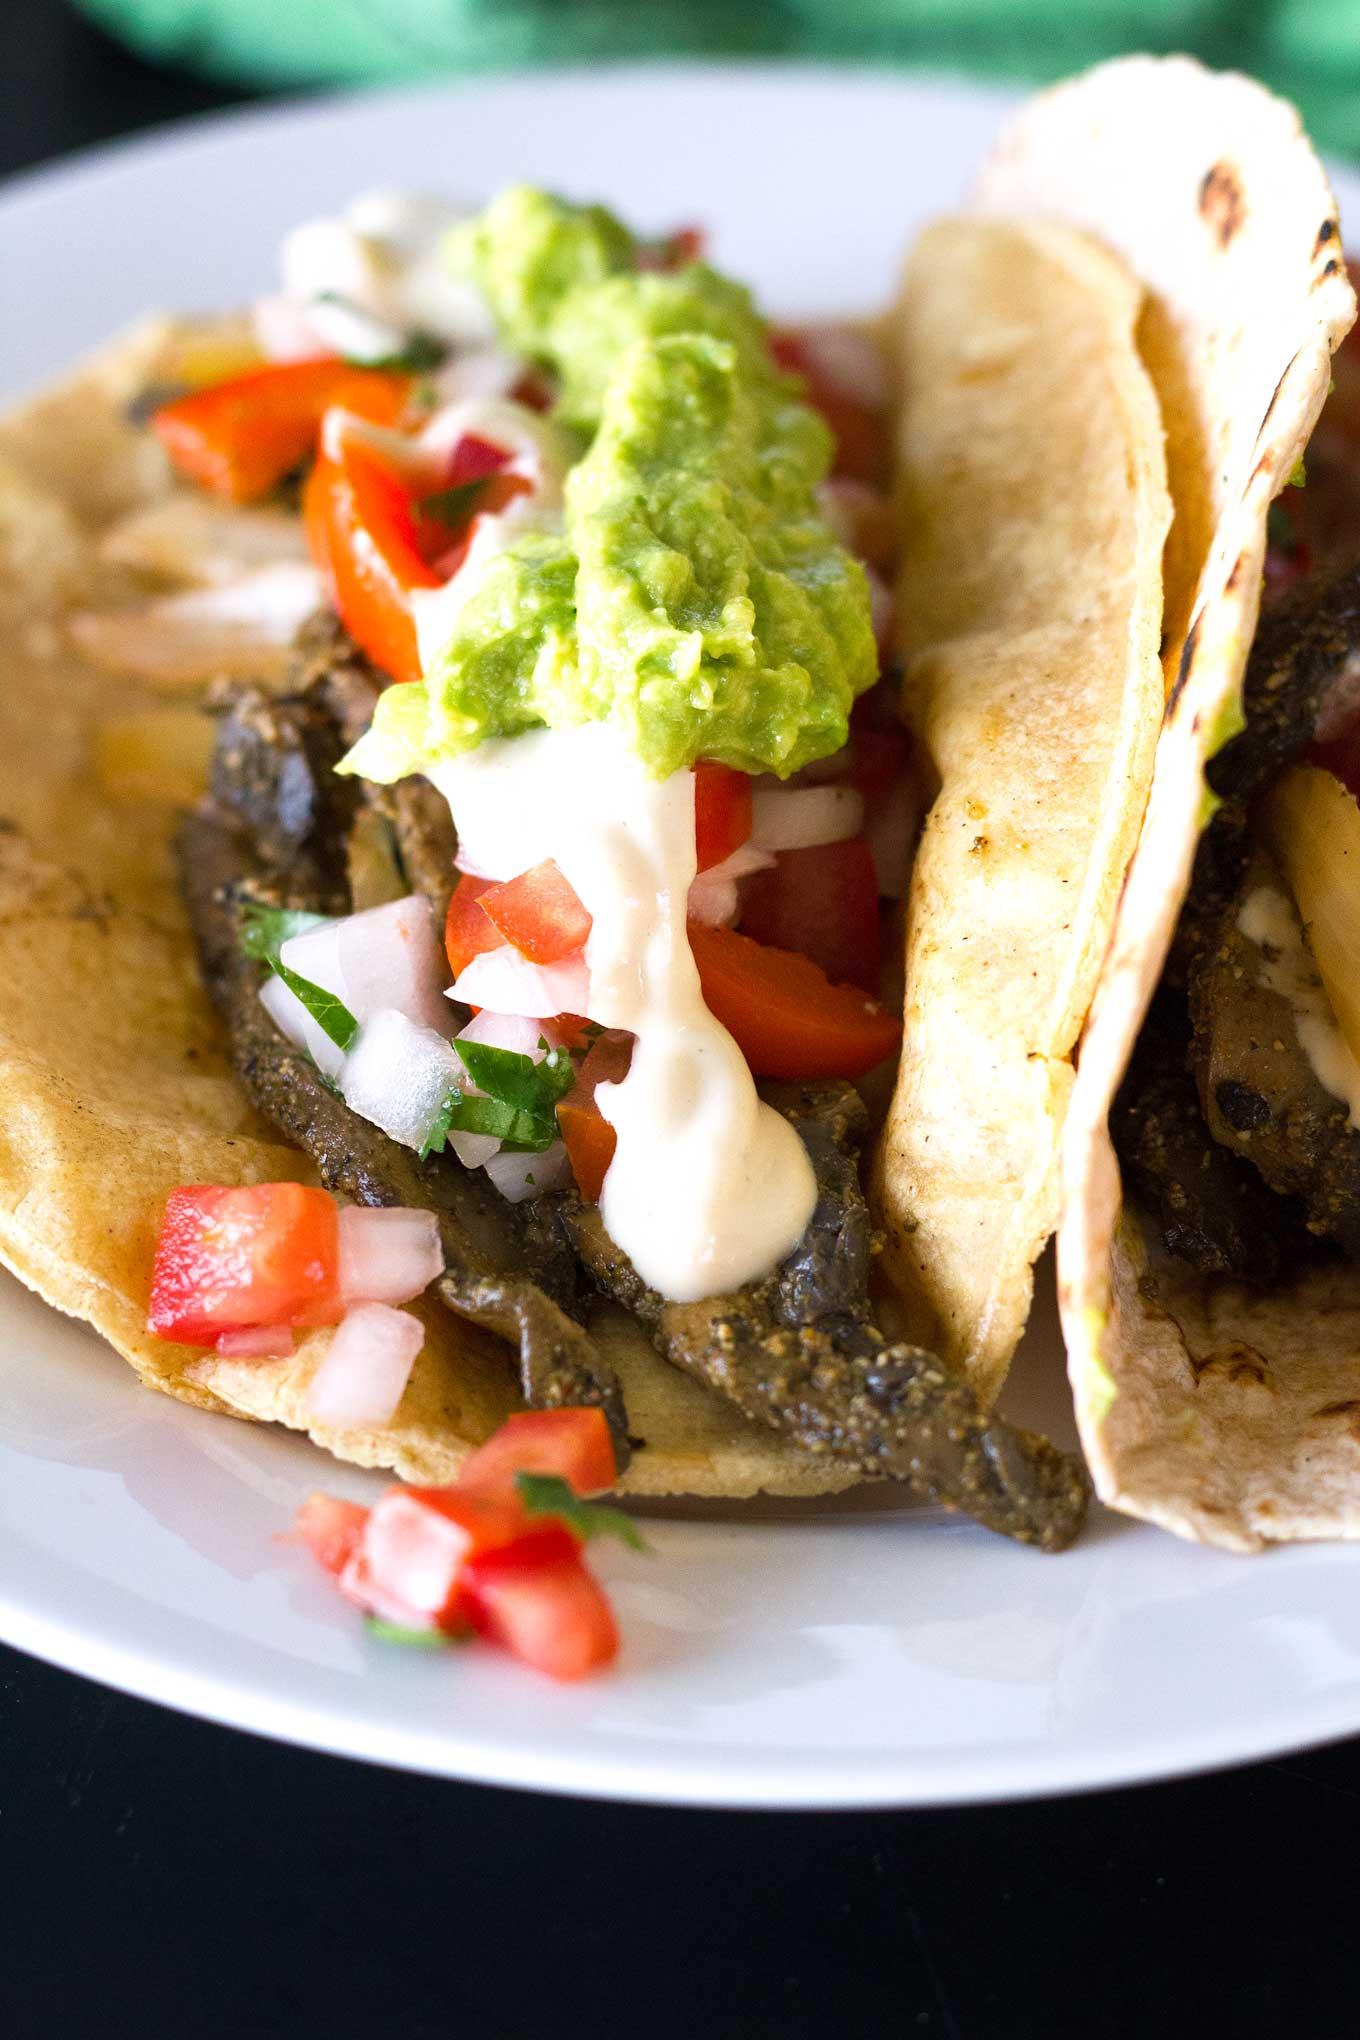 Ultimate Vegan Fajitas | Close-up of assembled fajitas on a plate topped with guacamole, pico de gallo, savory cashew cream | https://eatwithinyourmeans.com/